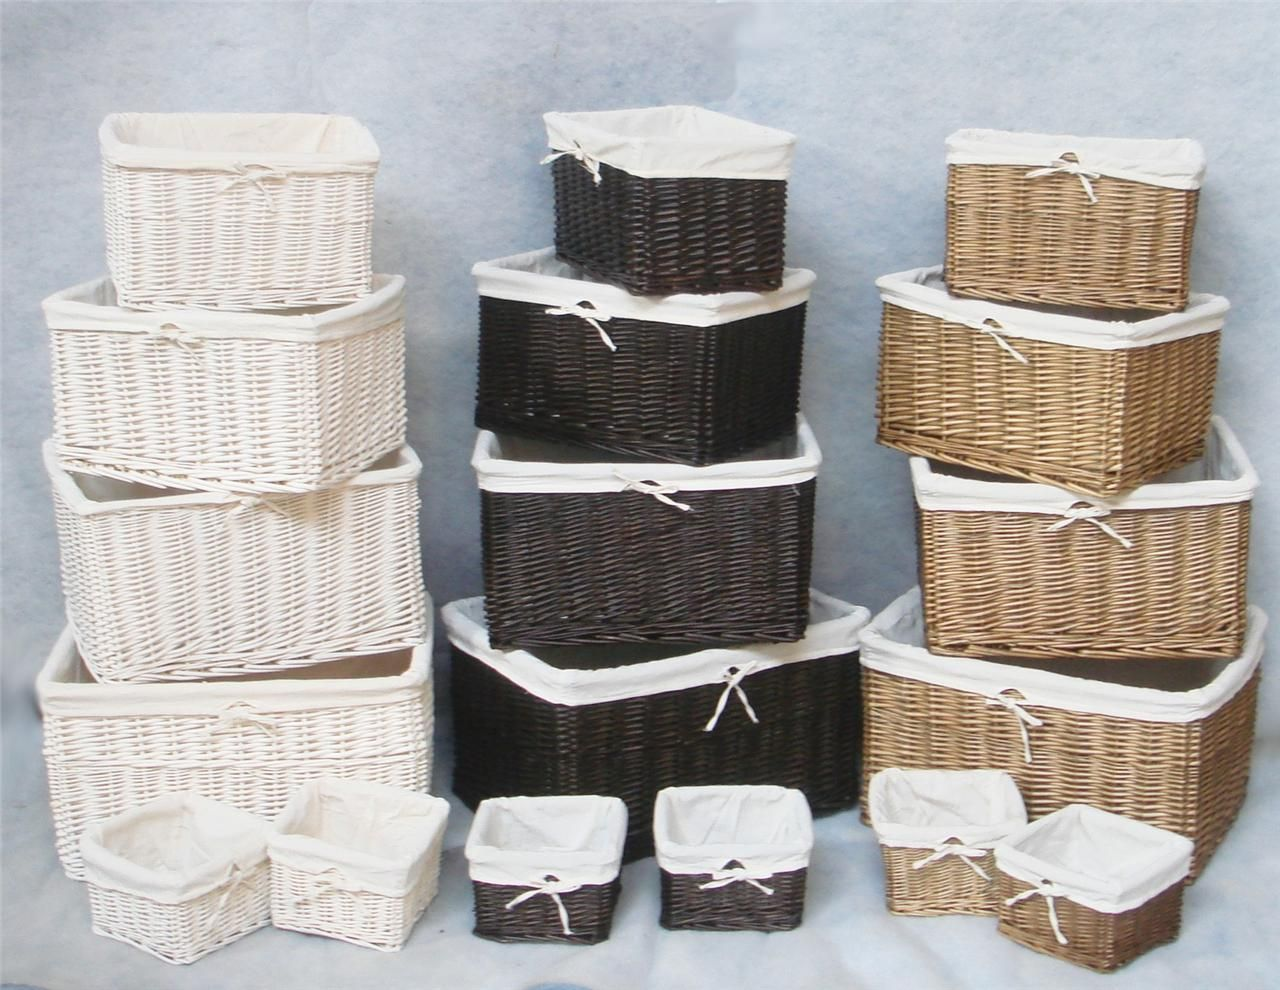 Decoration Wicker Baskets